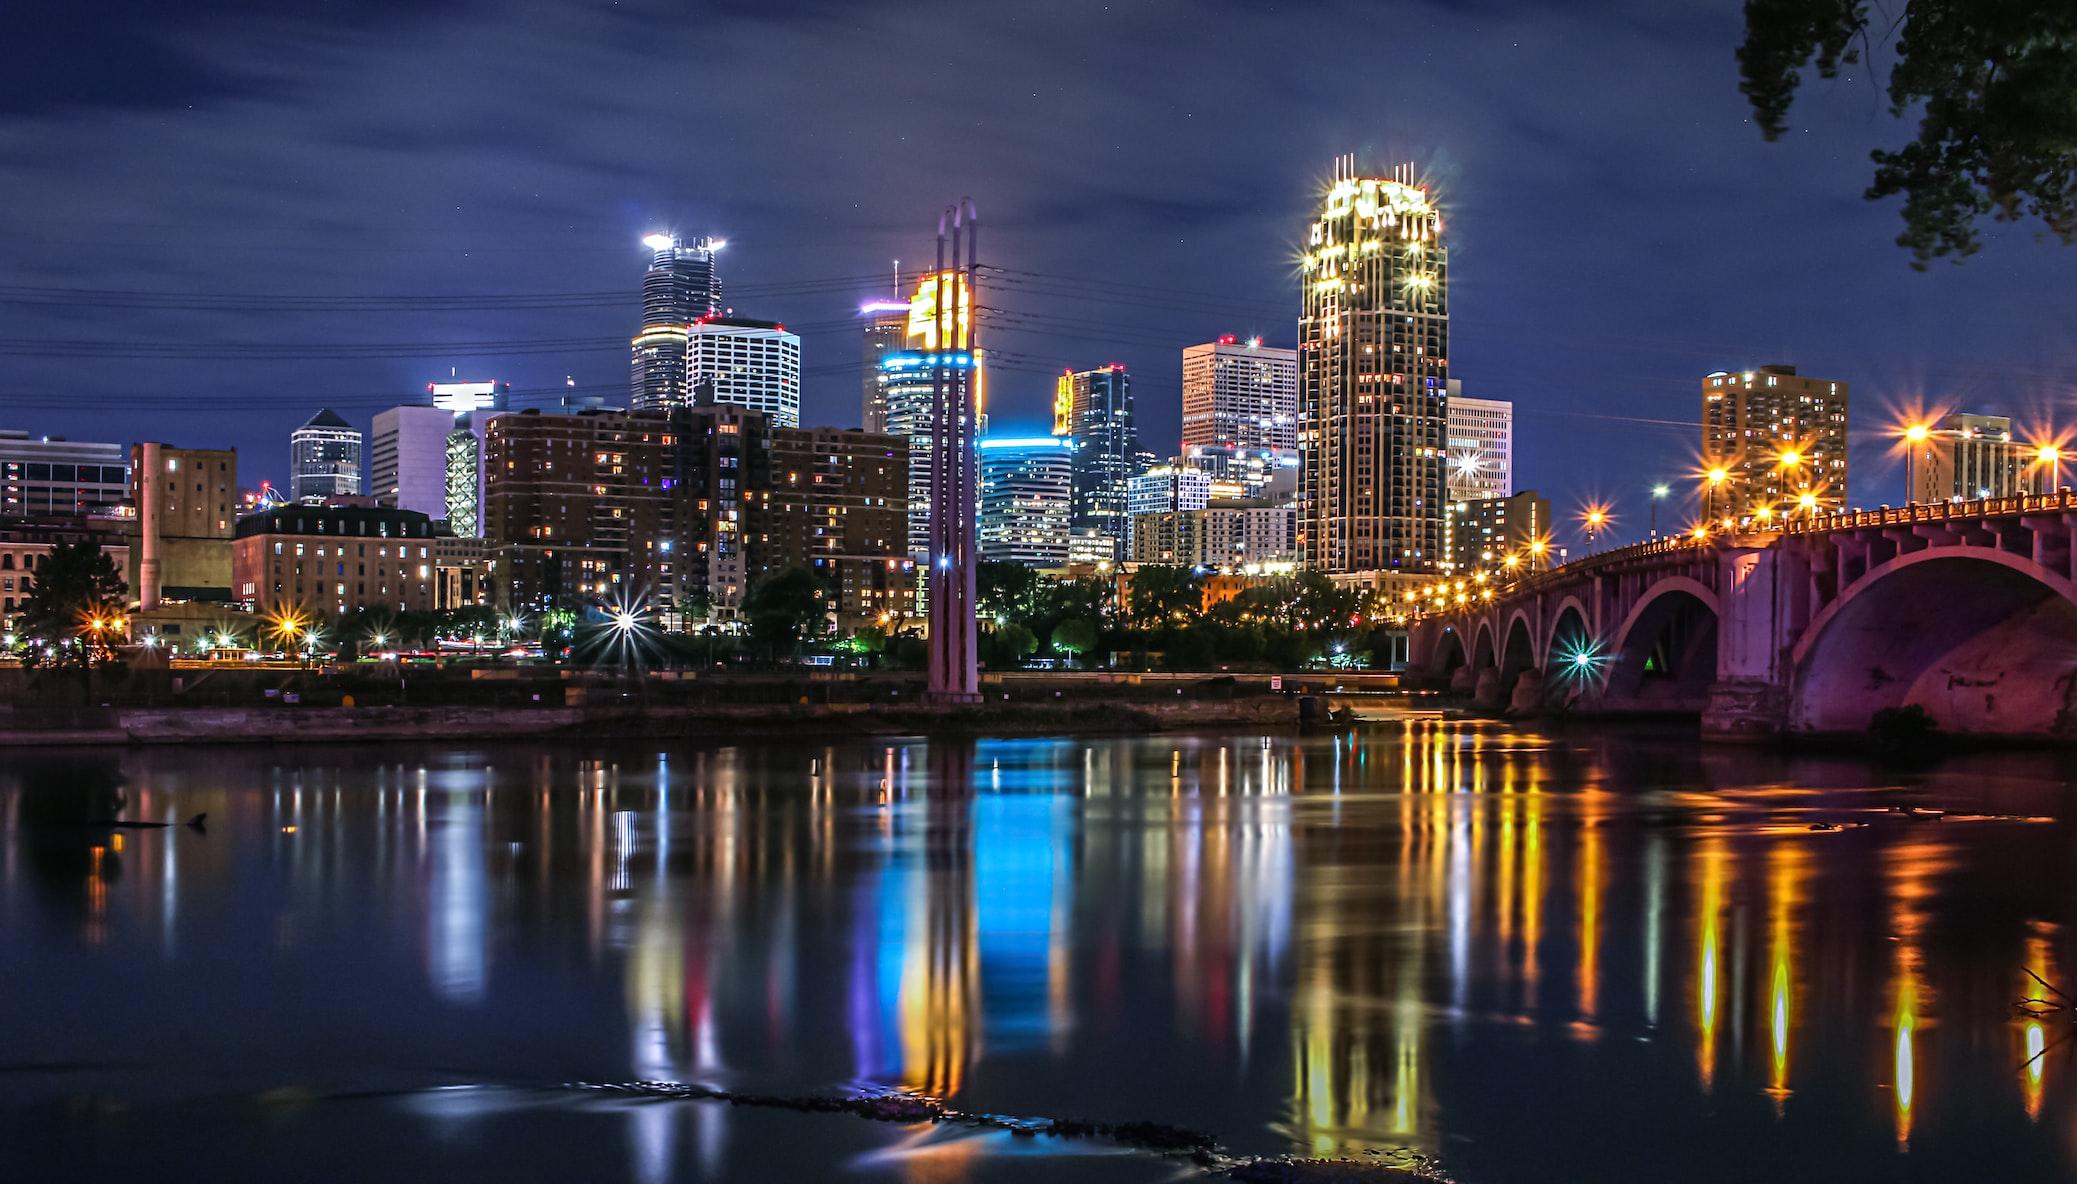 MN city skyline